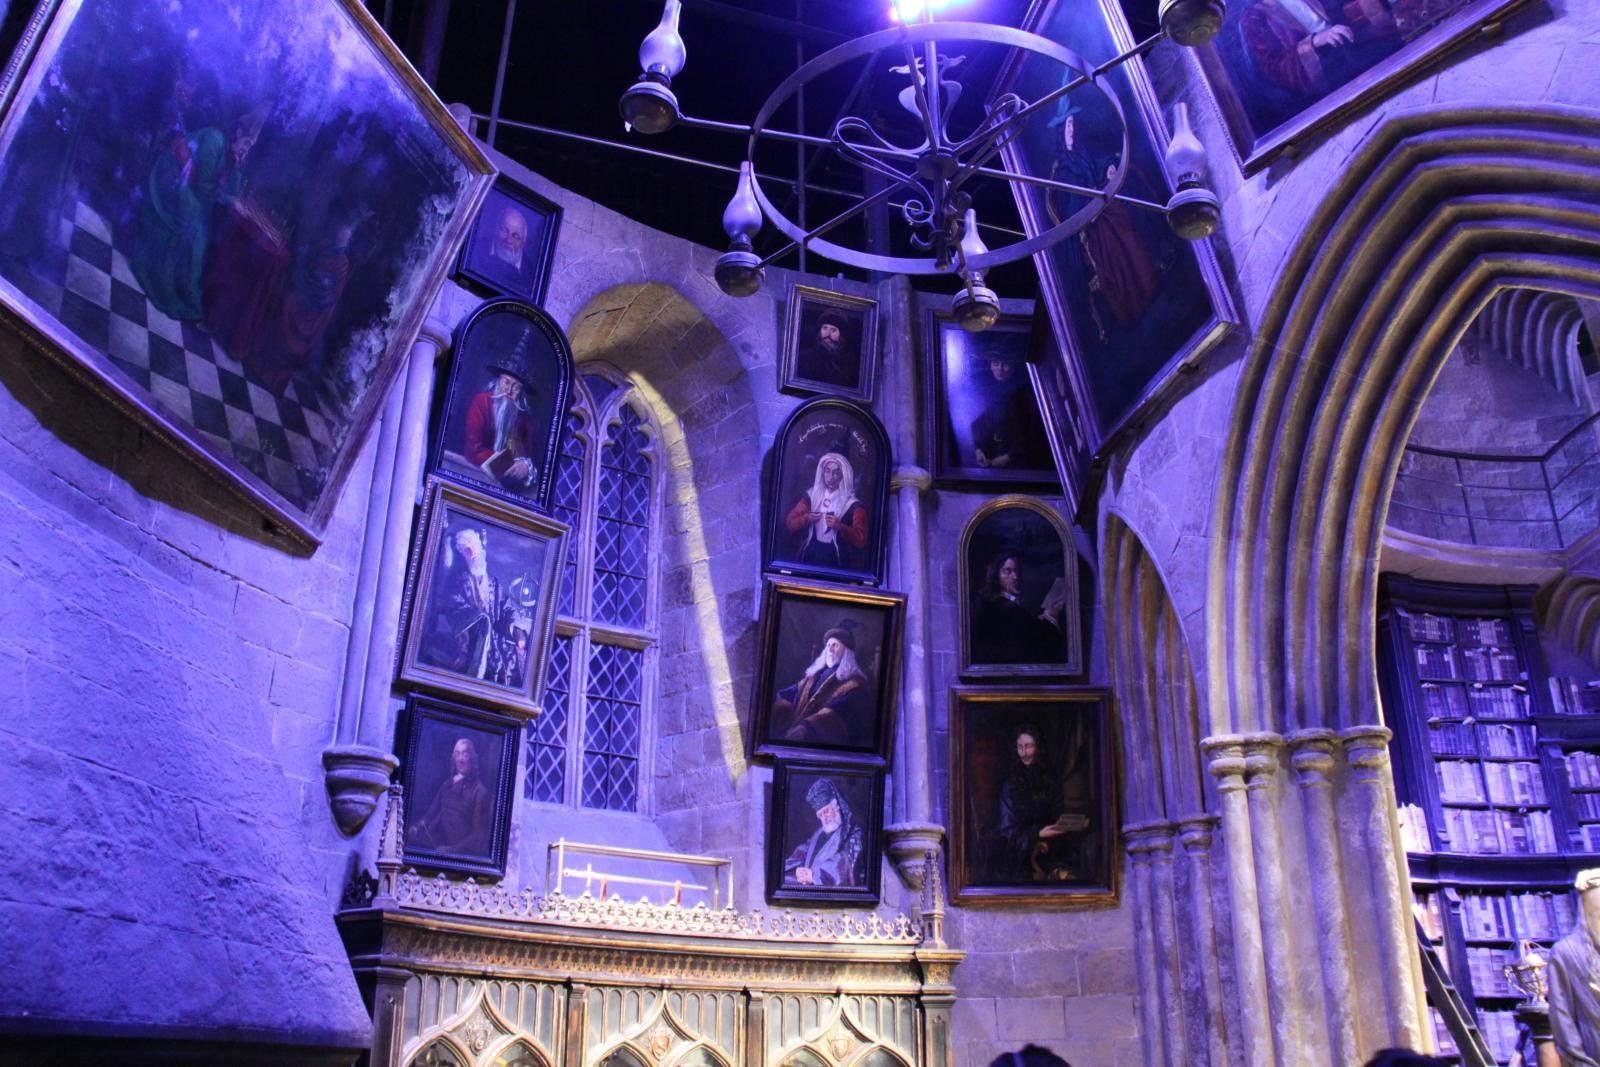 making harry potter11 The Making of Harry Potter, Warner Bros Studio London